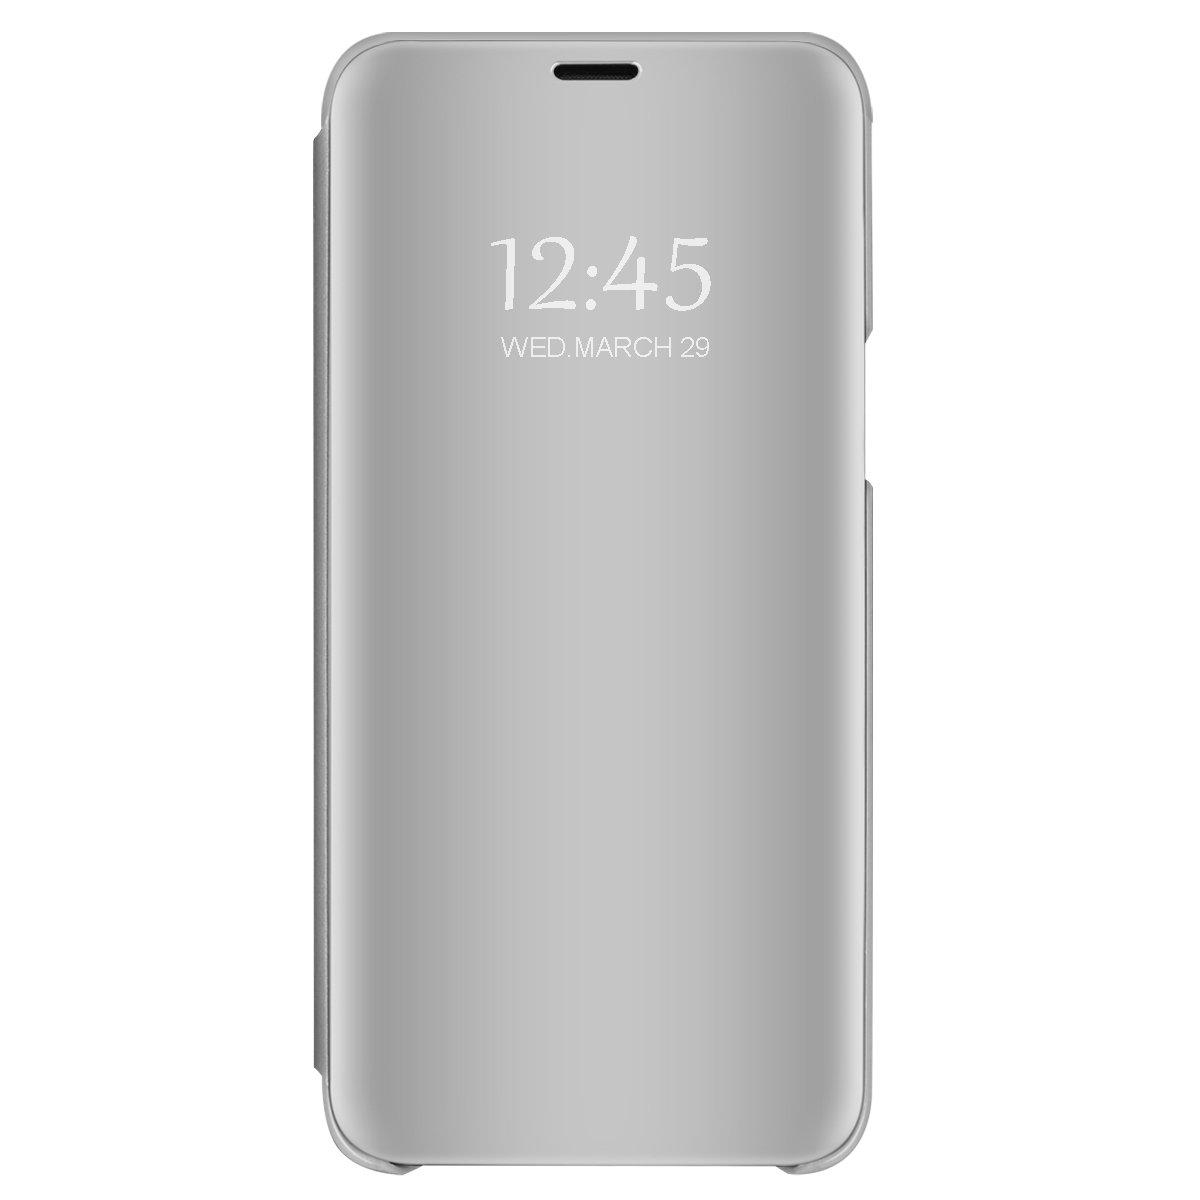 Case for Xiaomi Redmi 4X Translucent Mirror Screen Cover Flip Stand Hard Plating Shell for Redmi 4X (3, Redmi 4X)